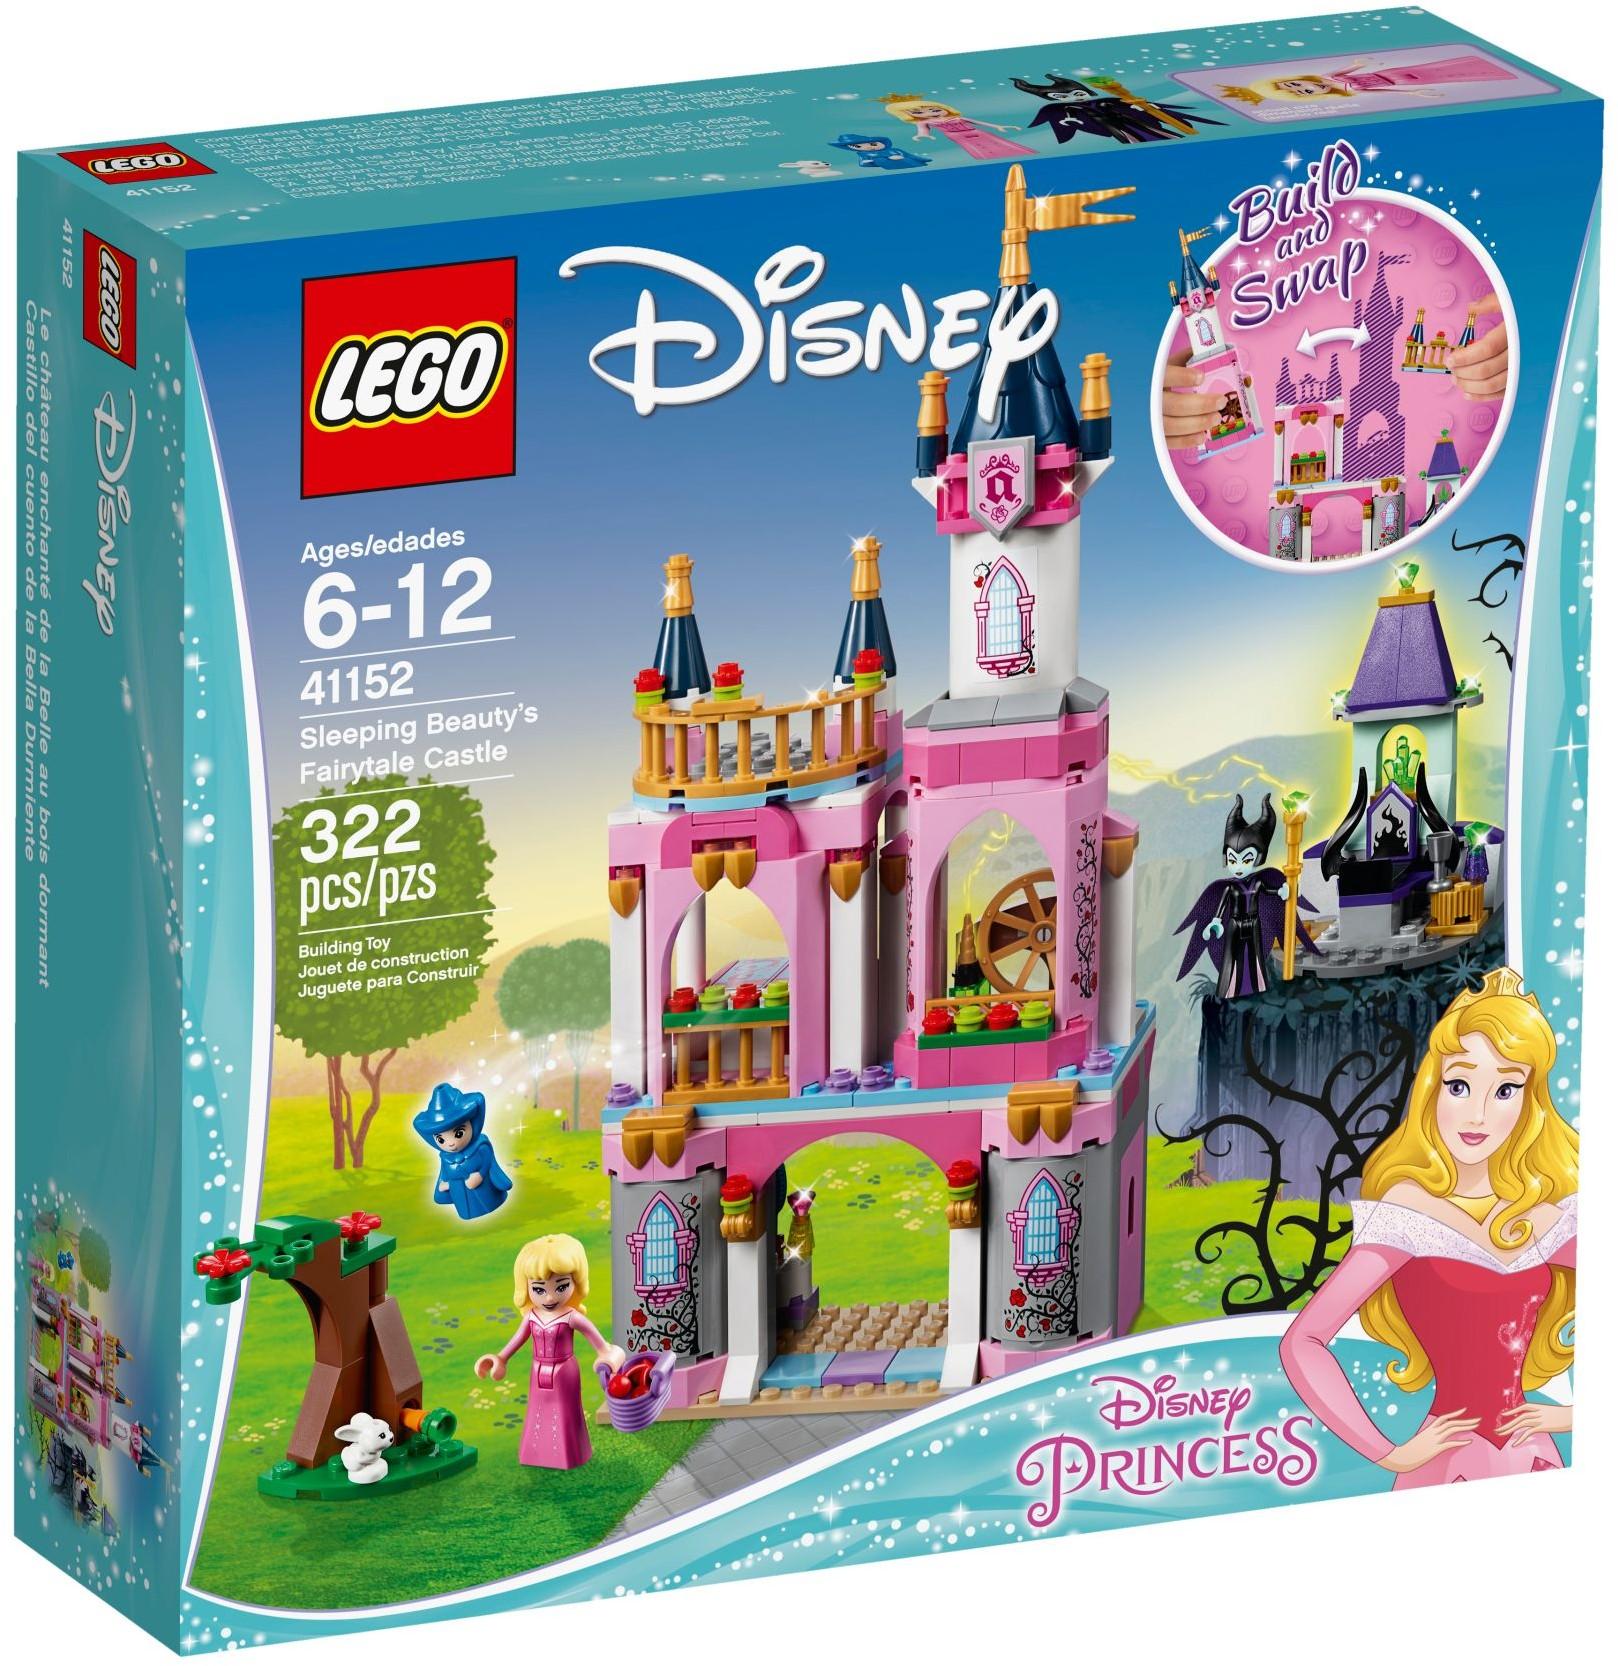 41152 Sleeping Beauty's Fairytale Castle